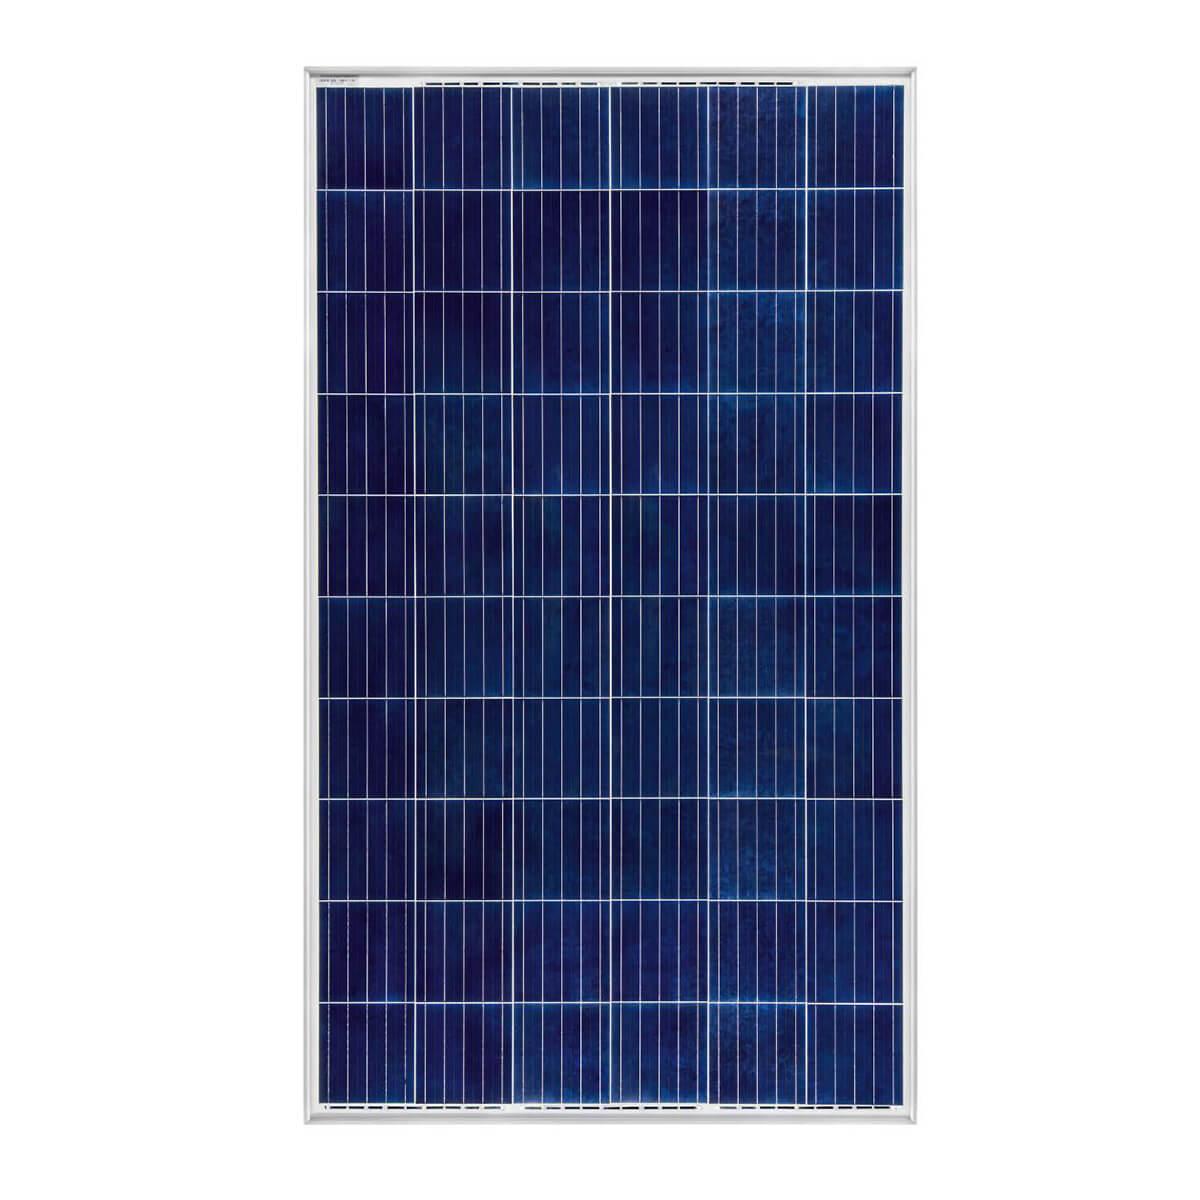 Odul solar 290W panel, odul solar 290Watt panel, Odul solar 290 W panel, odul solar 290 Watt panel, odul solar 290 Watt polikristal panel, Odul solar 290 W watt gunes paneli, odul solar 290 W watt polikristal gunes paneli, odul solar 290 W Watt fotovoltaik polikristal solar panel, odul solar 290W polikristal gunes enerjisi, odul solar OSPp60-290W panel, ÖDÜL SOLAR 290 WATT